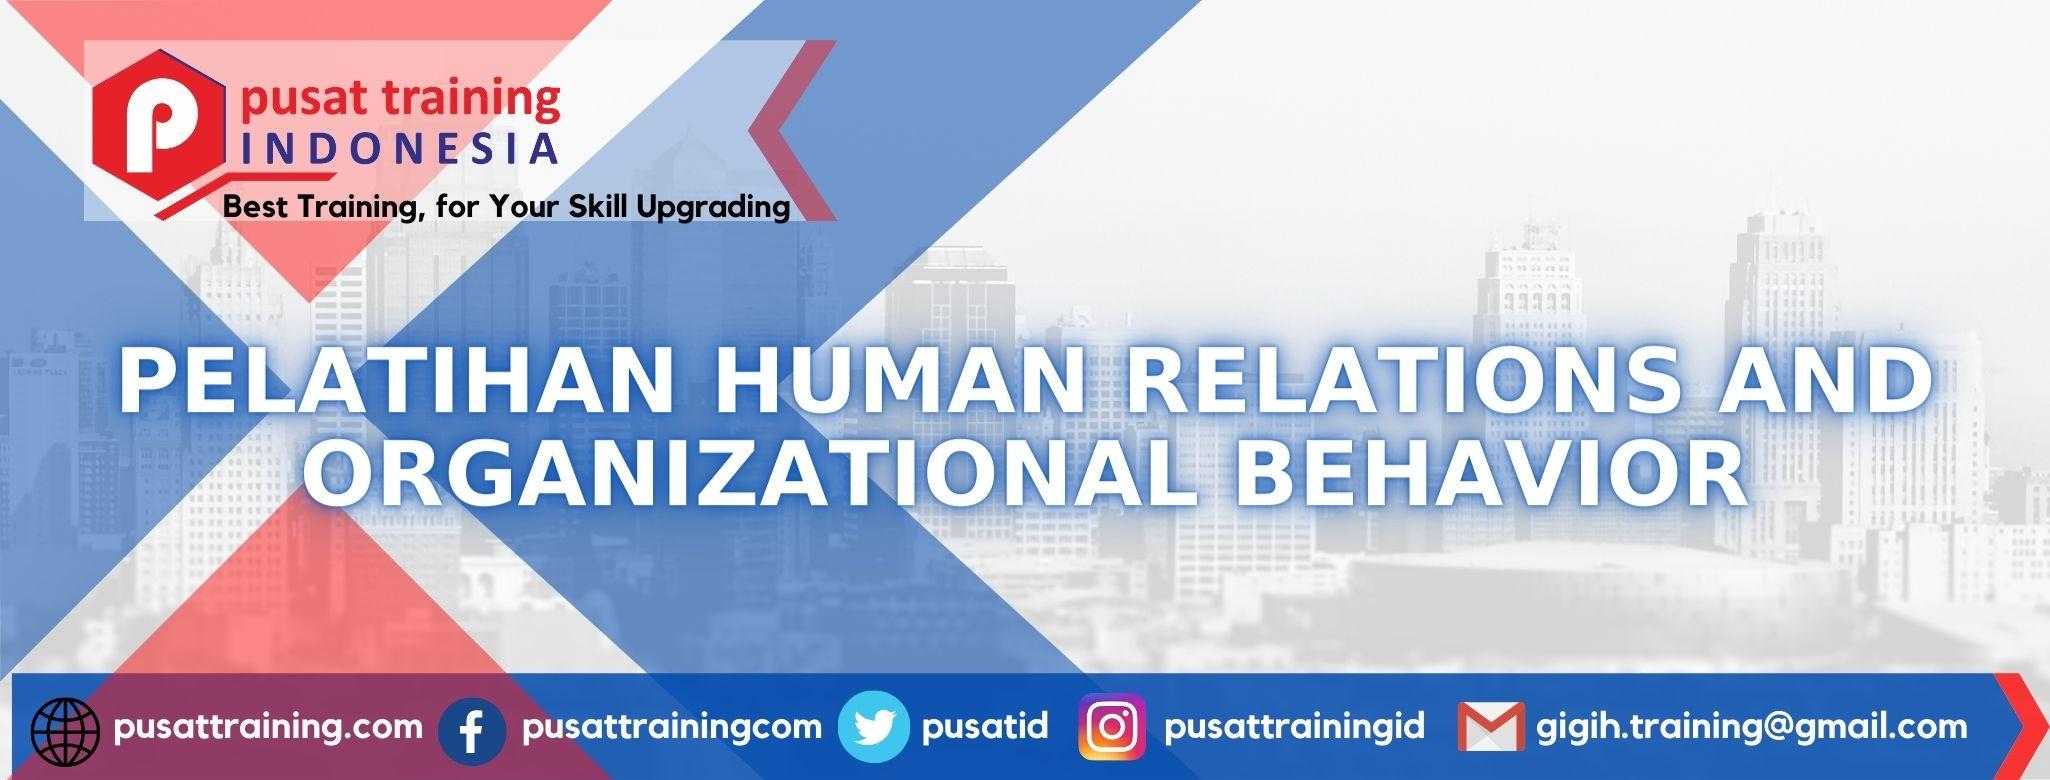 pelatihan-human-relations-and-organizational-behavior